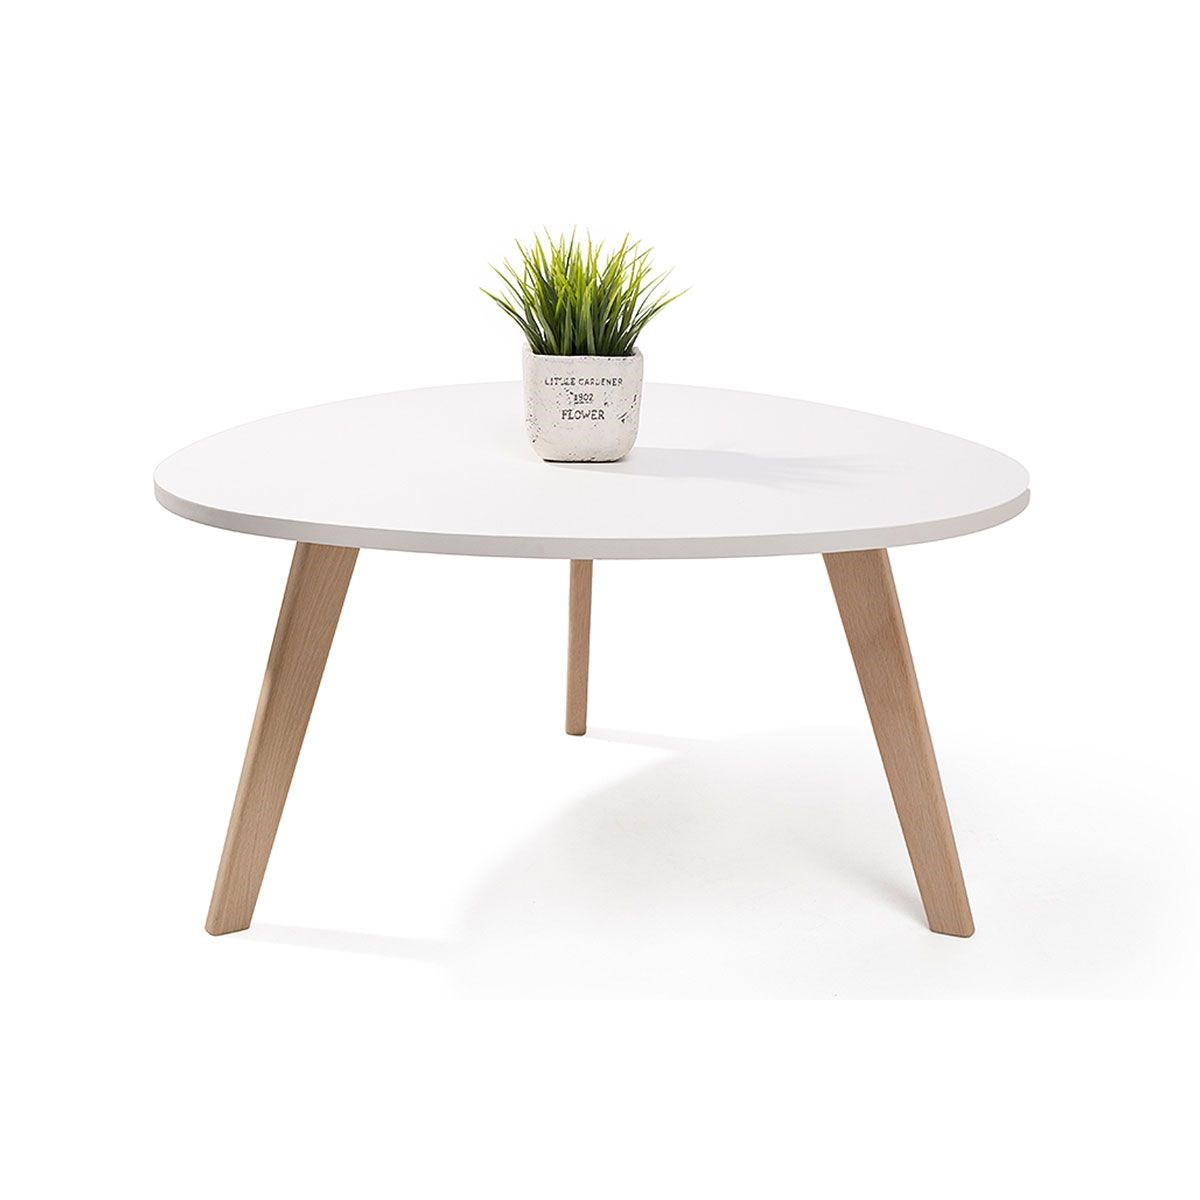 Alta table basse scandinave blanc 80x42cm nordique galet for Table basse scandinave galet